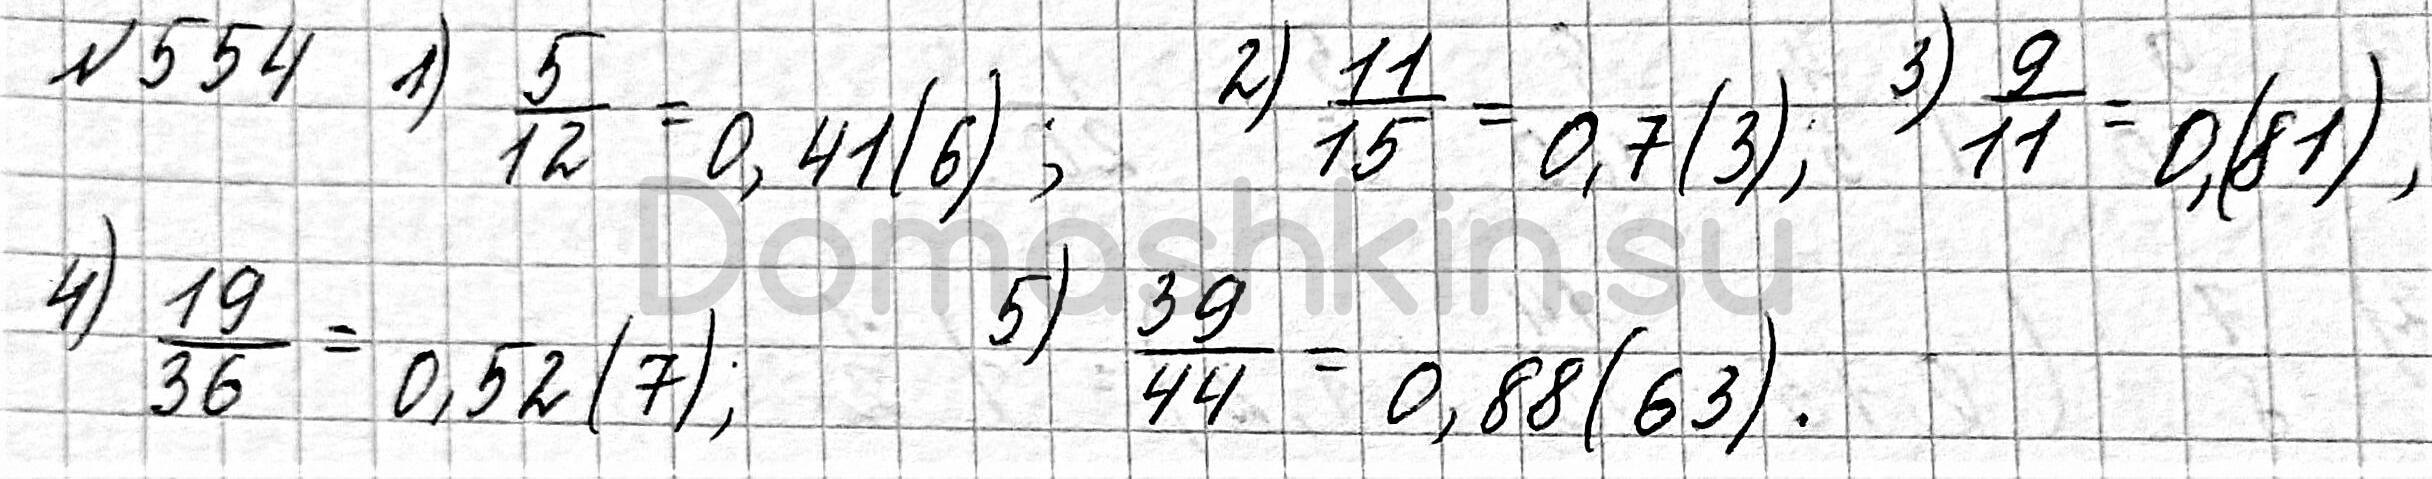 Математика 6 класс учебник Мерзляк номер 554 решение